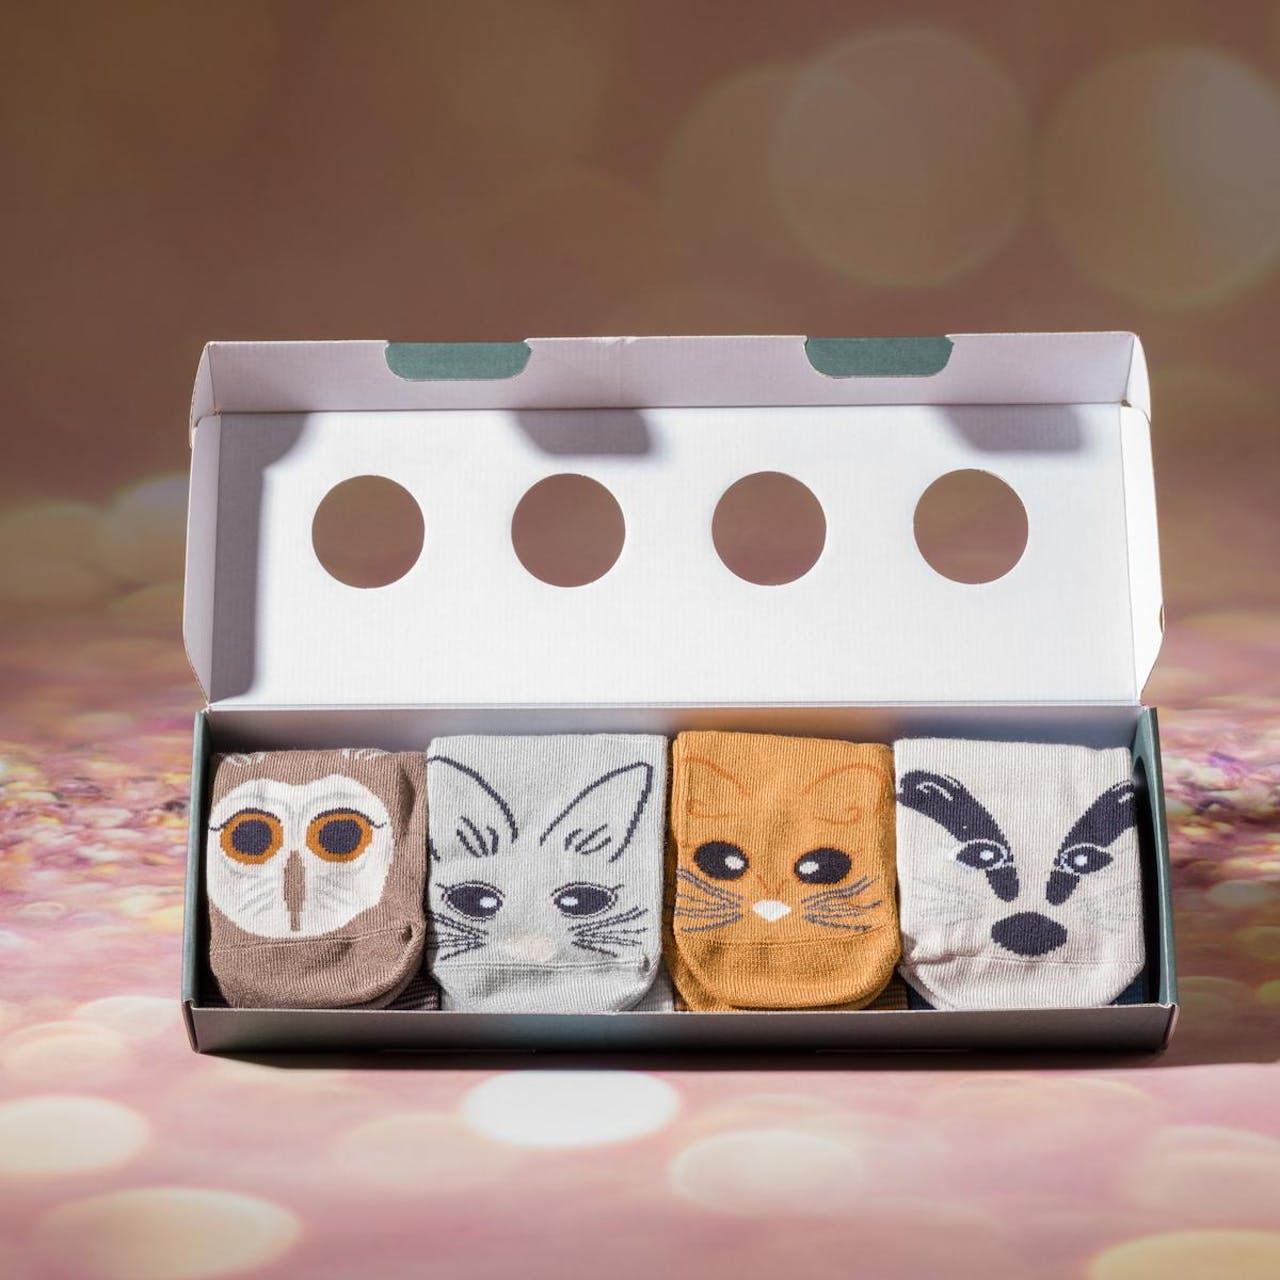 Seasalt Women's Sailor Socks Box Gift Set